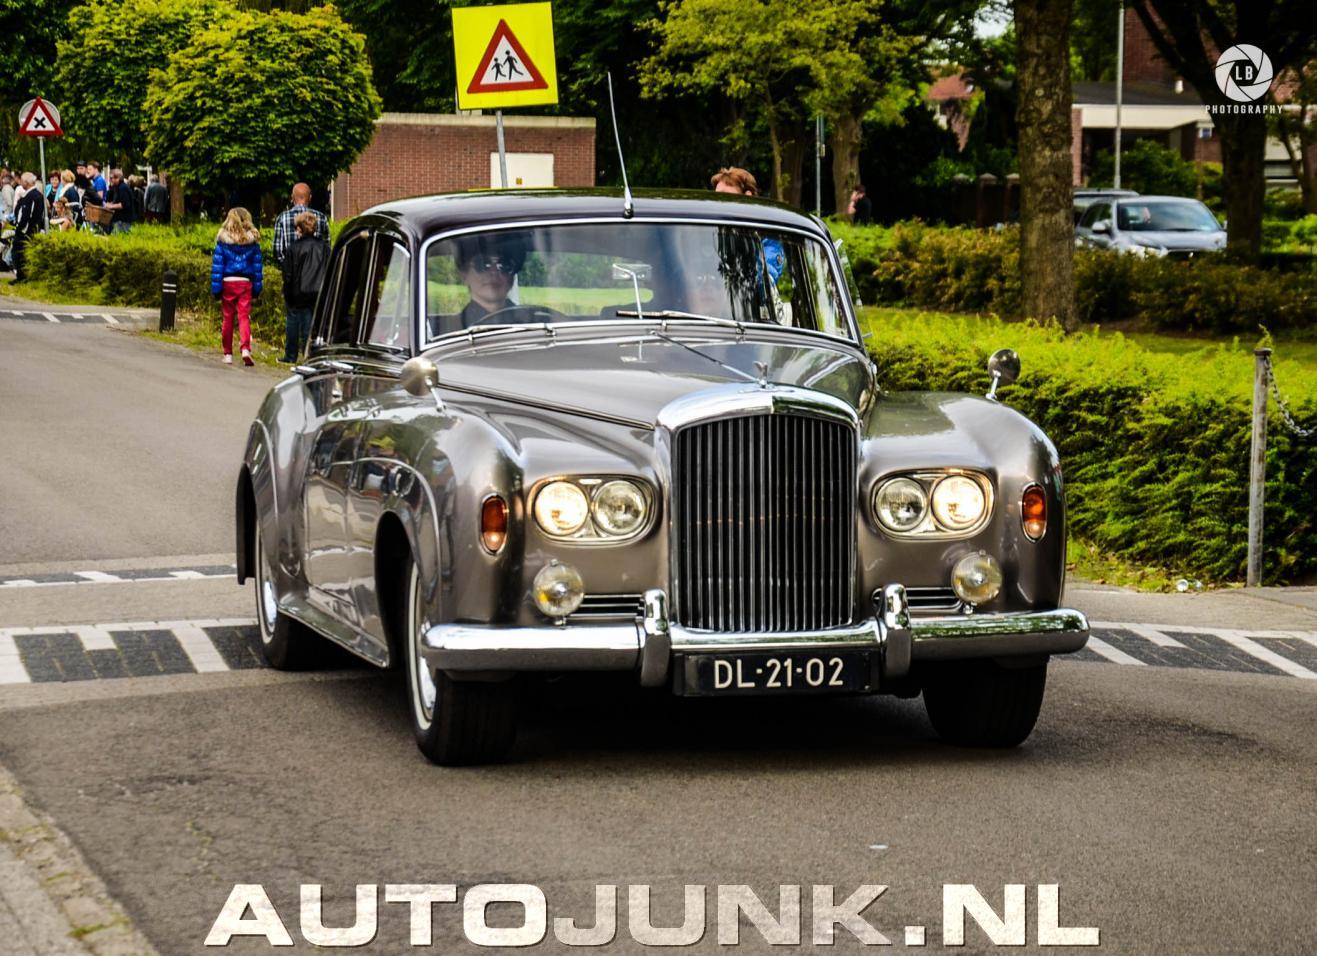 Bentley Saloon S3 foto's » Autojunk.nl (143053)